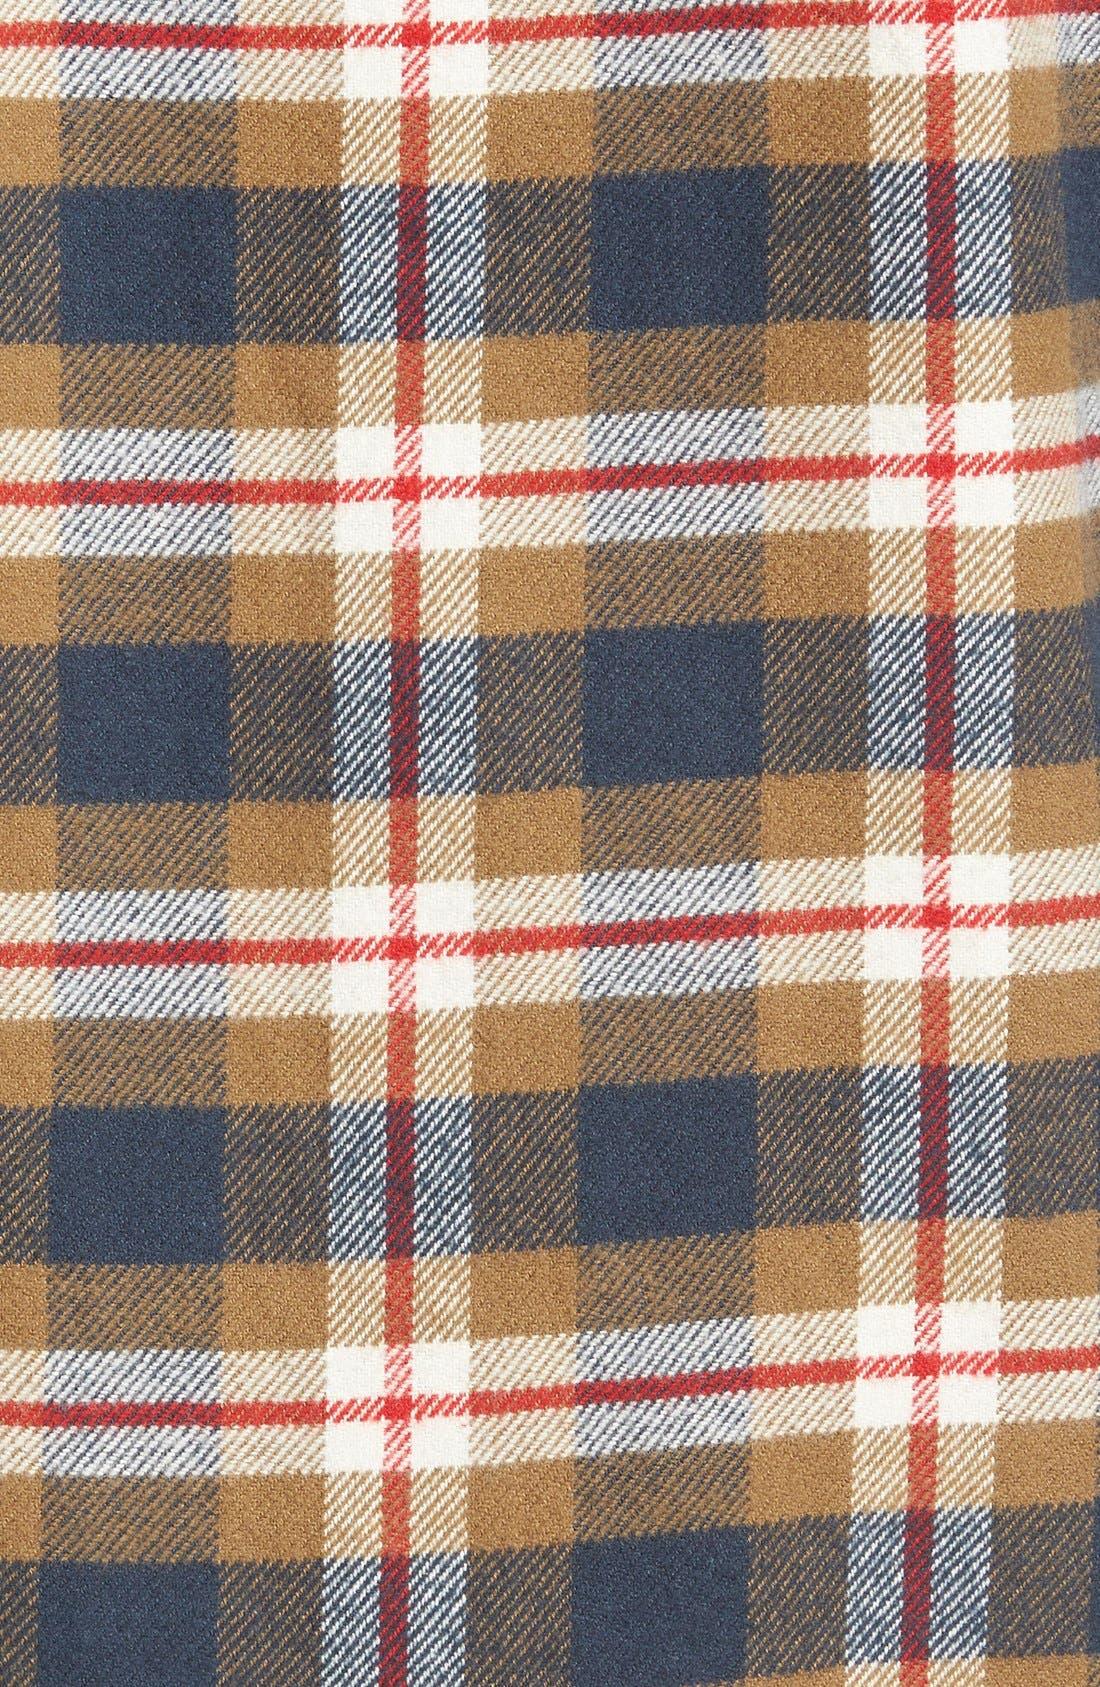 'That'll Work' Trim Fit Plaid Flannel Shirt,                             Alternate thumbnail 22, color,